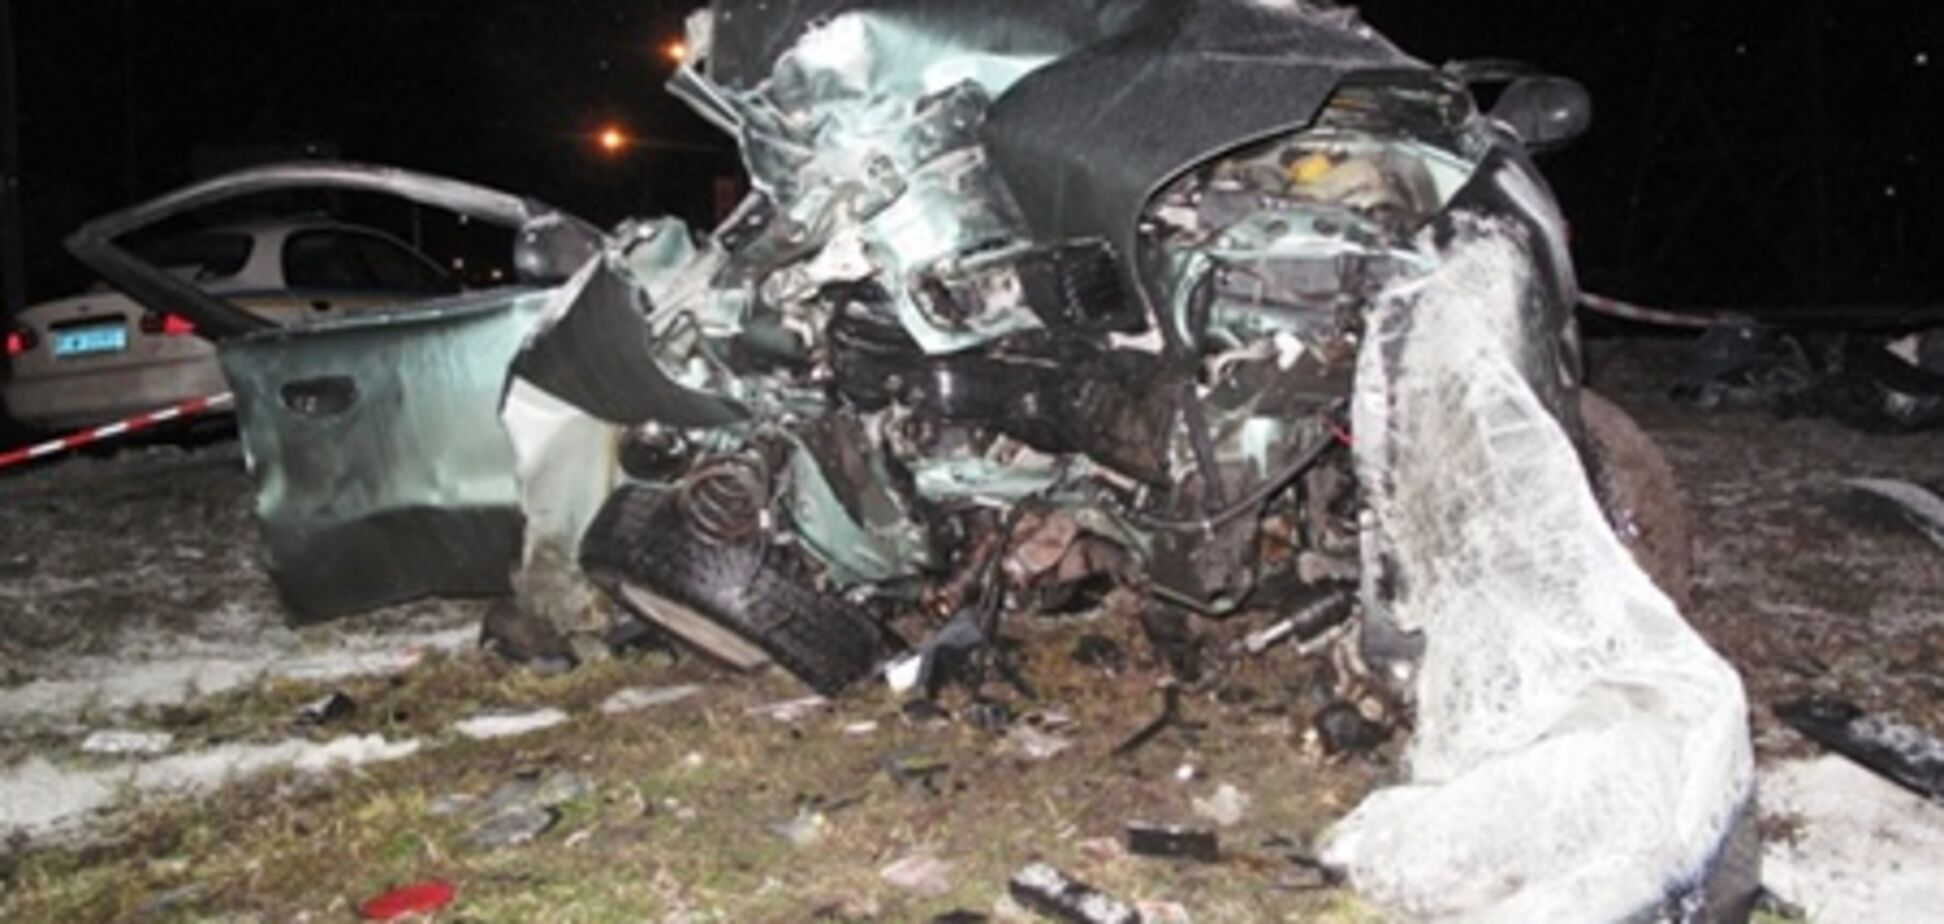 Ситуация на дорогах за 3 марта: 52 ДТП, 13 погибших